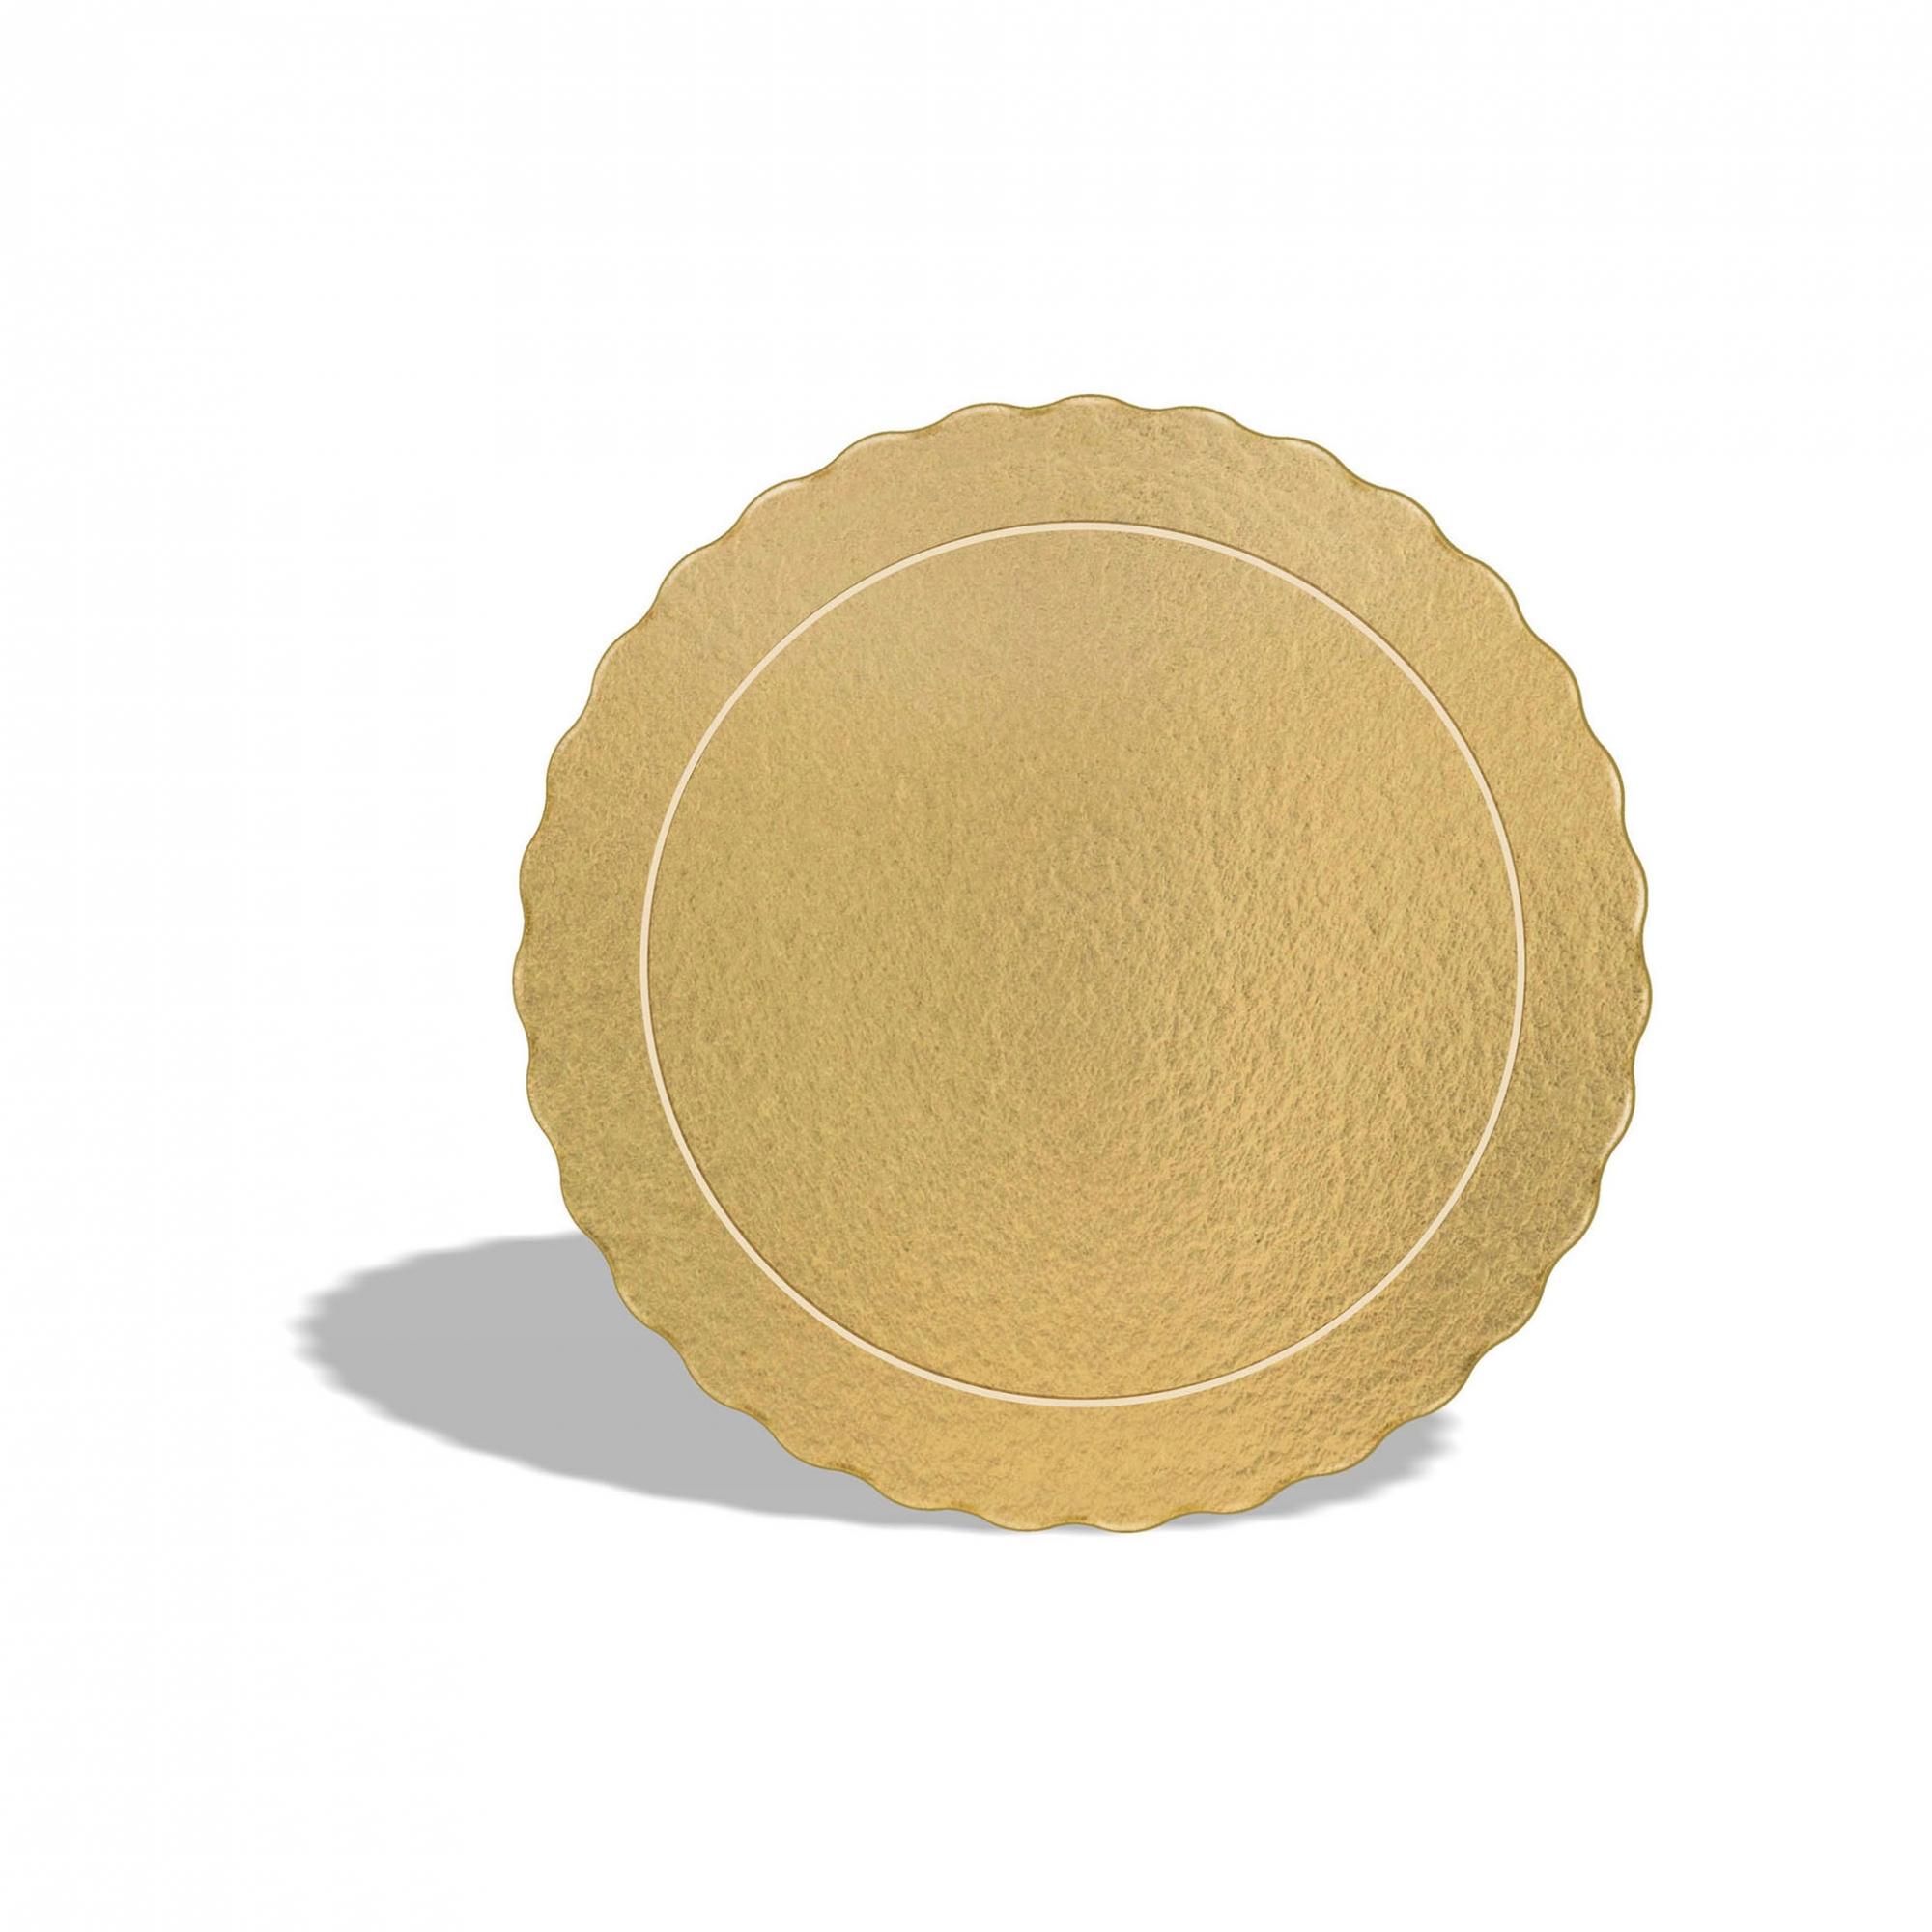 200 Bases Laminadas, Suporte P/ Bolo, Cake Board, 25cm - Ouro